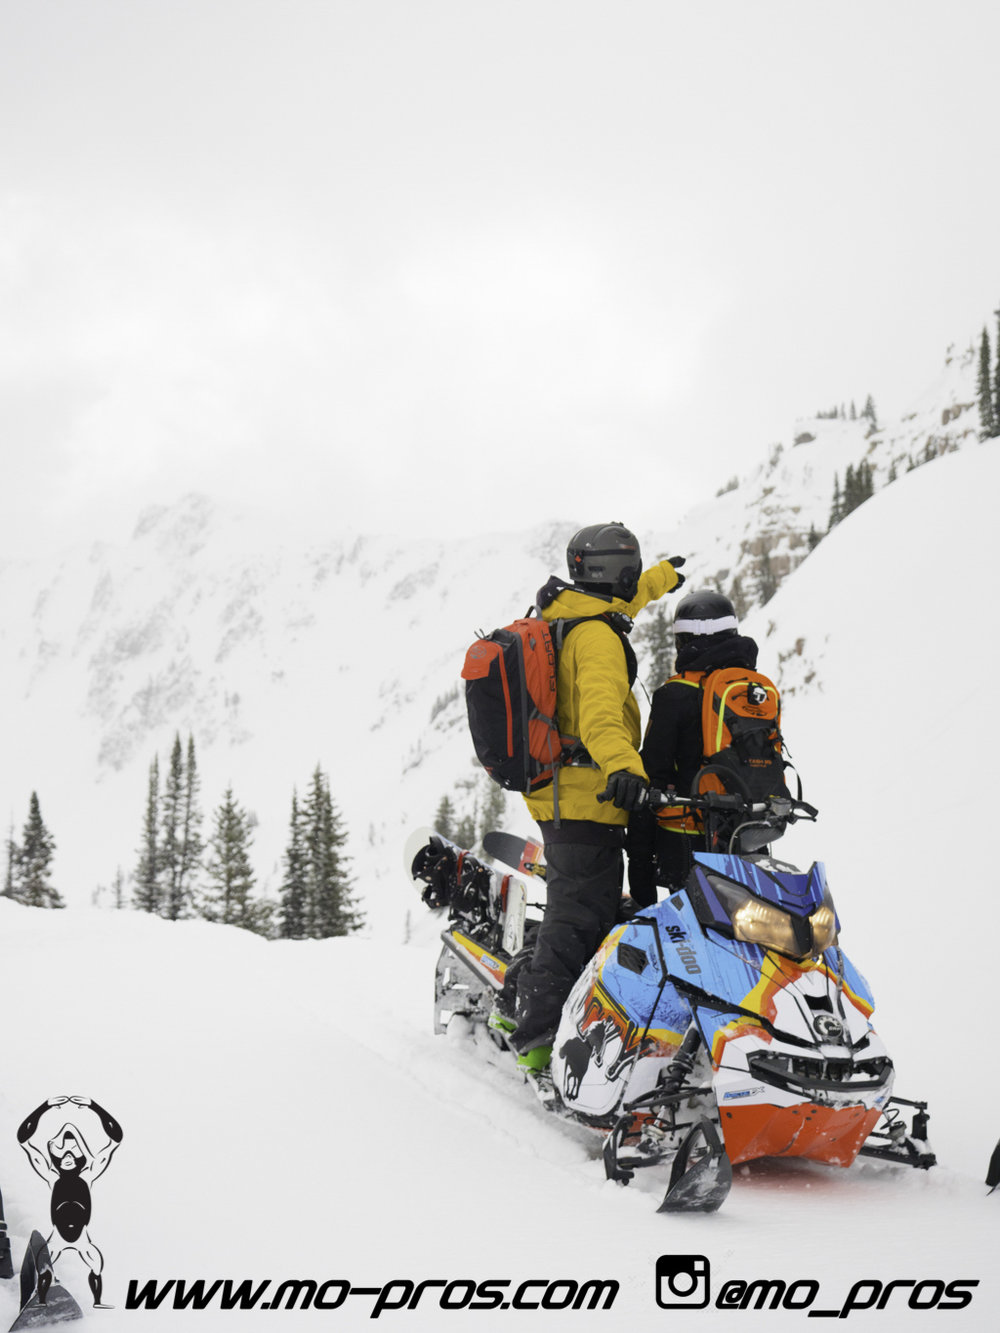 89_Snowbike_Timbersled Rack_Tsaina Rack_CFR rack_Cheetah Factory Racing_Snowboard rack_snowboard_snowmobile bag_Snowmobile_timbersled bag_gas Rack_Gear_Gun Rack_LinQ Snowboard Ski_Ski_Snowboarding_Ti.jpg